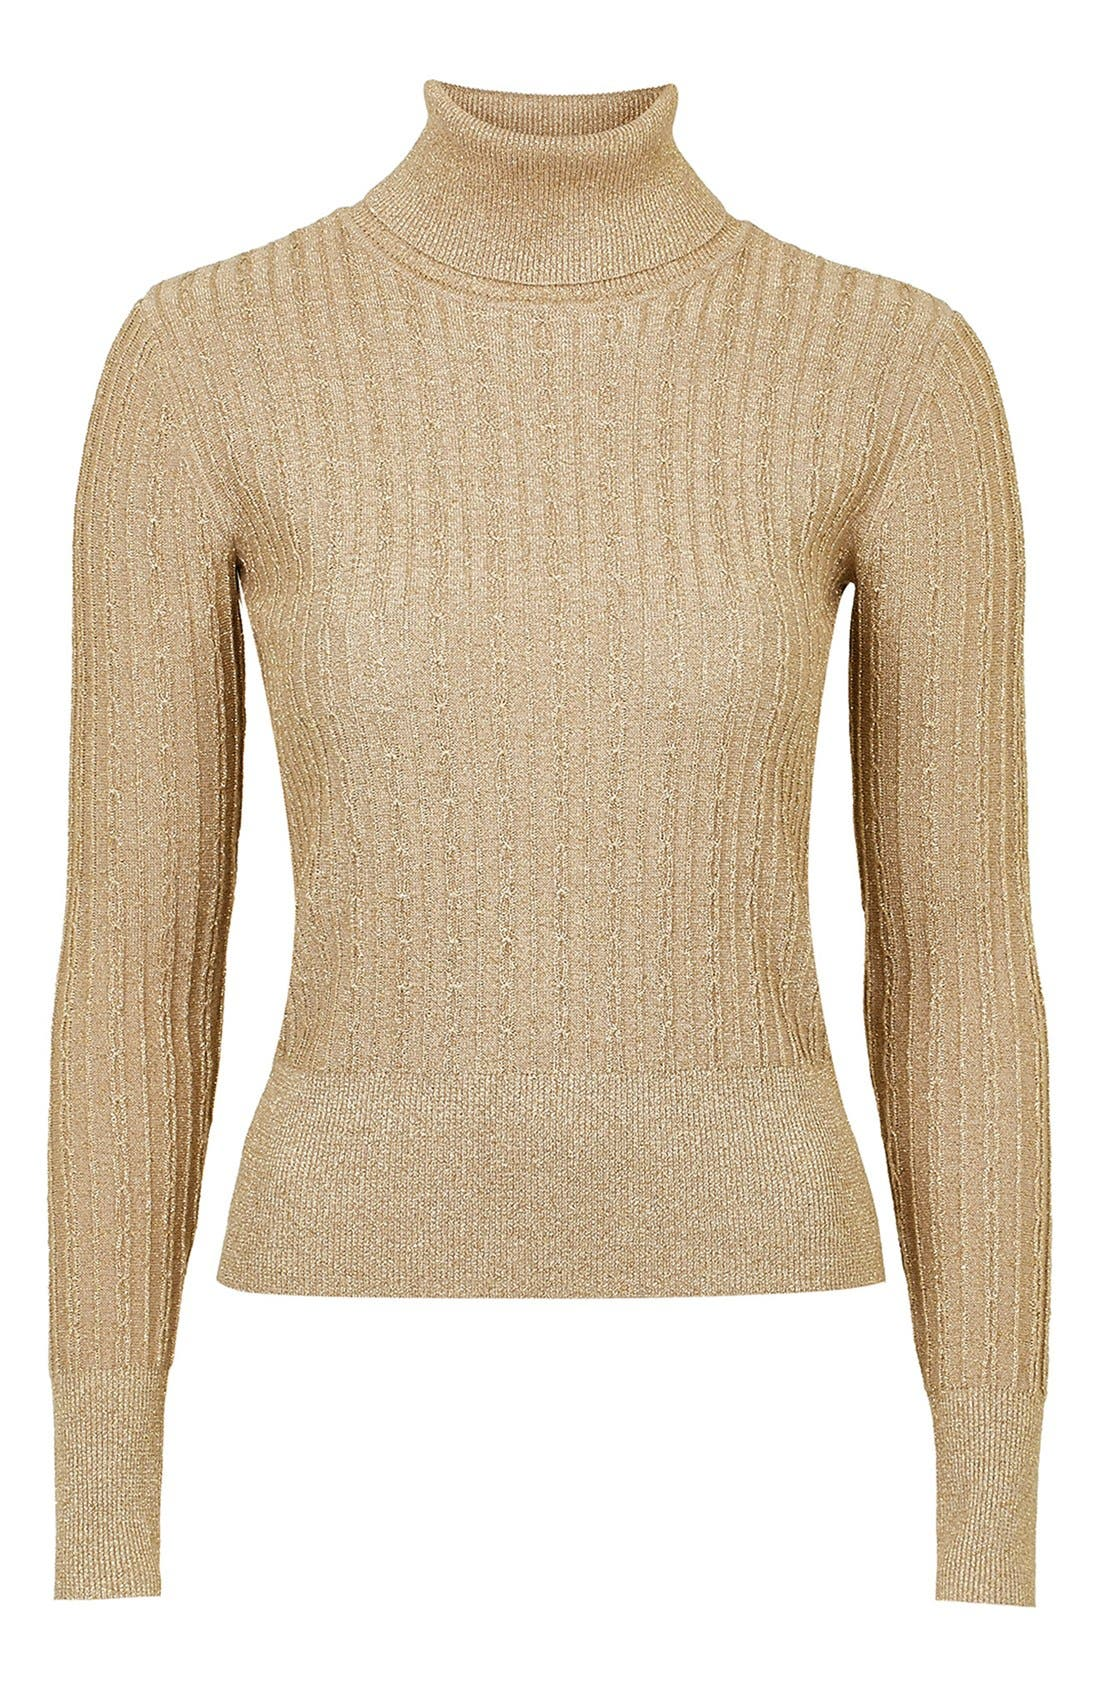 TopshopUnique 'Huntly' Turtleneck Sweater,                             Alternate thumbnail 4, color,                             710